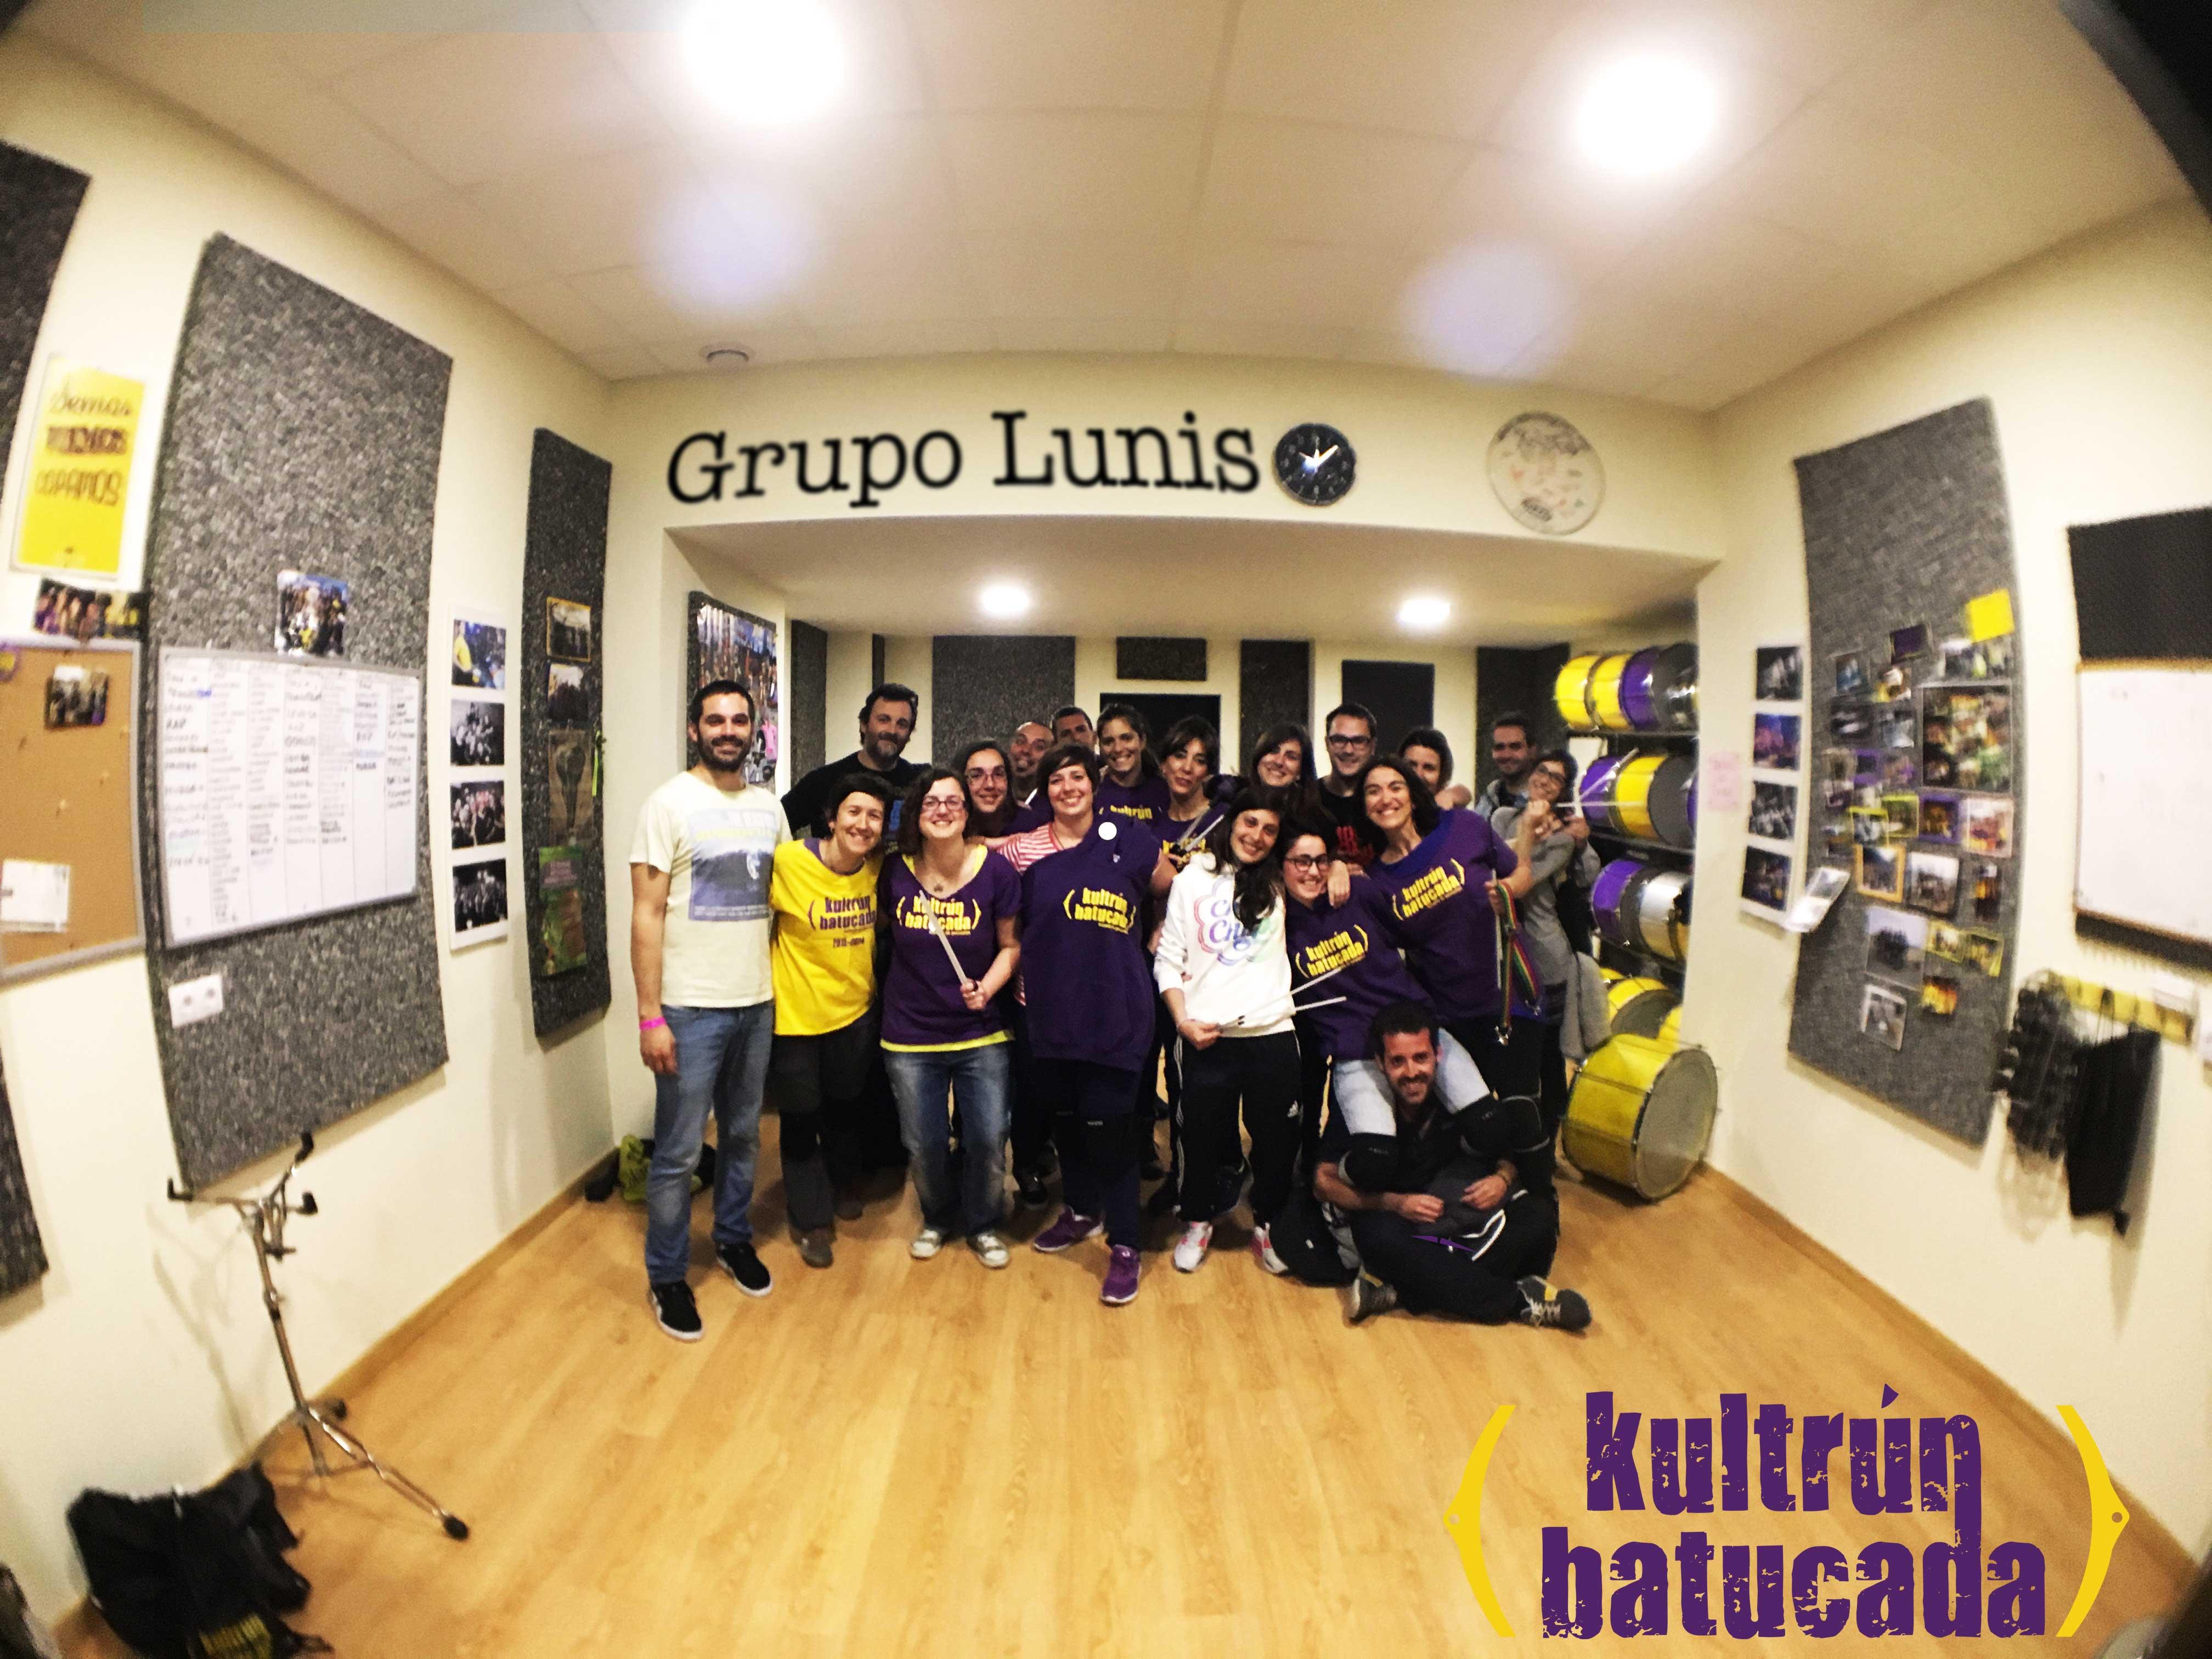 Grupo Lunes Kultrun batucada